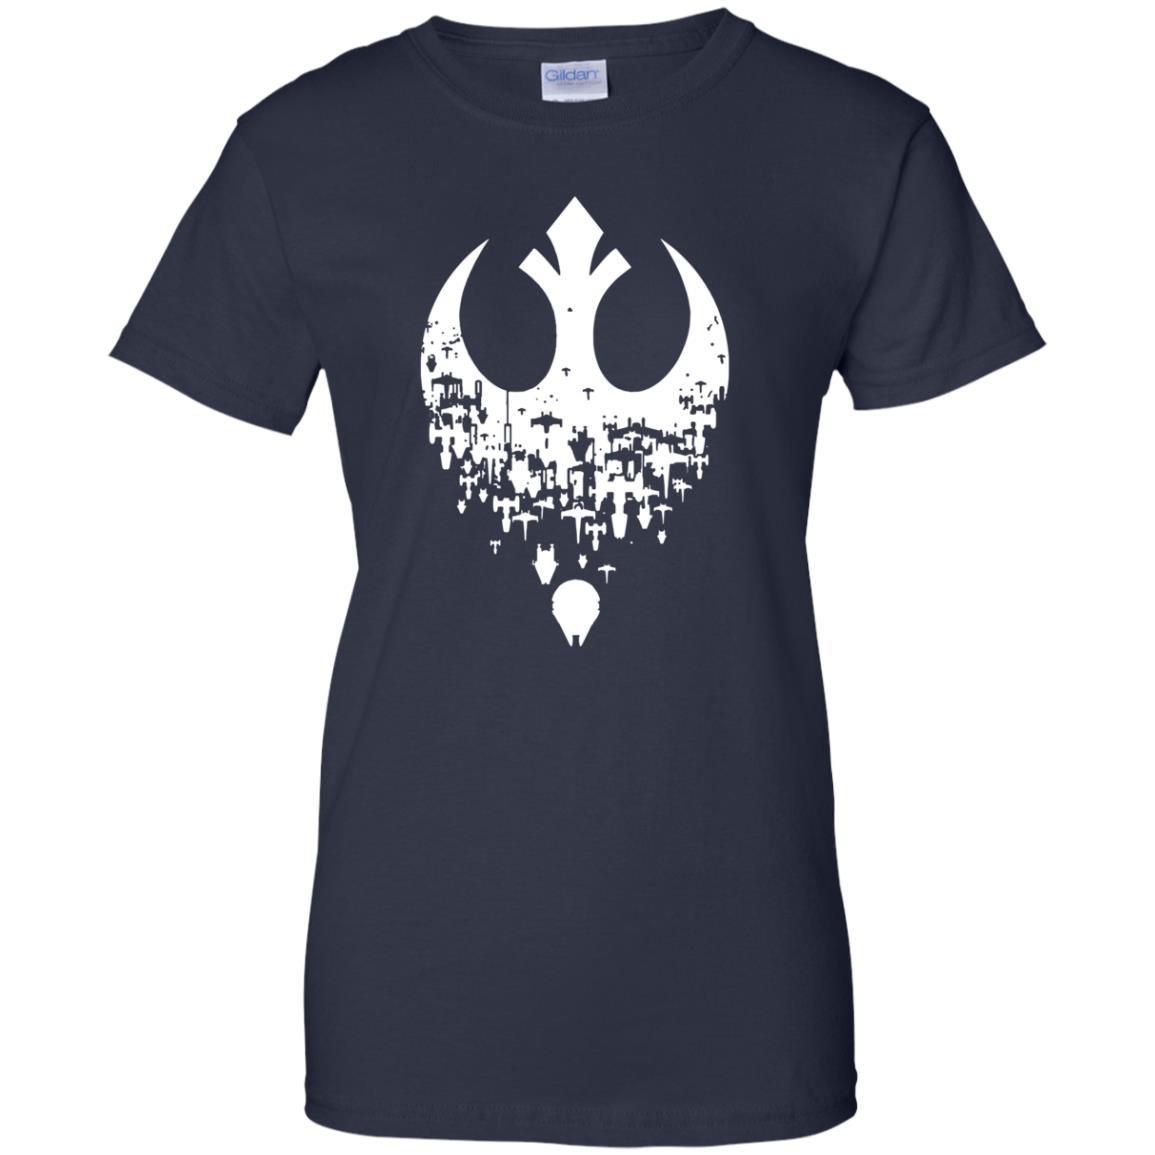 image 1510 - Star Wars Fractured Rebellion shirt, hoodie, tank